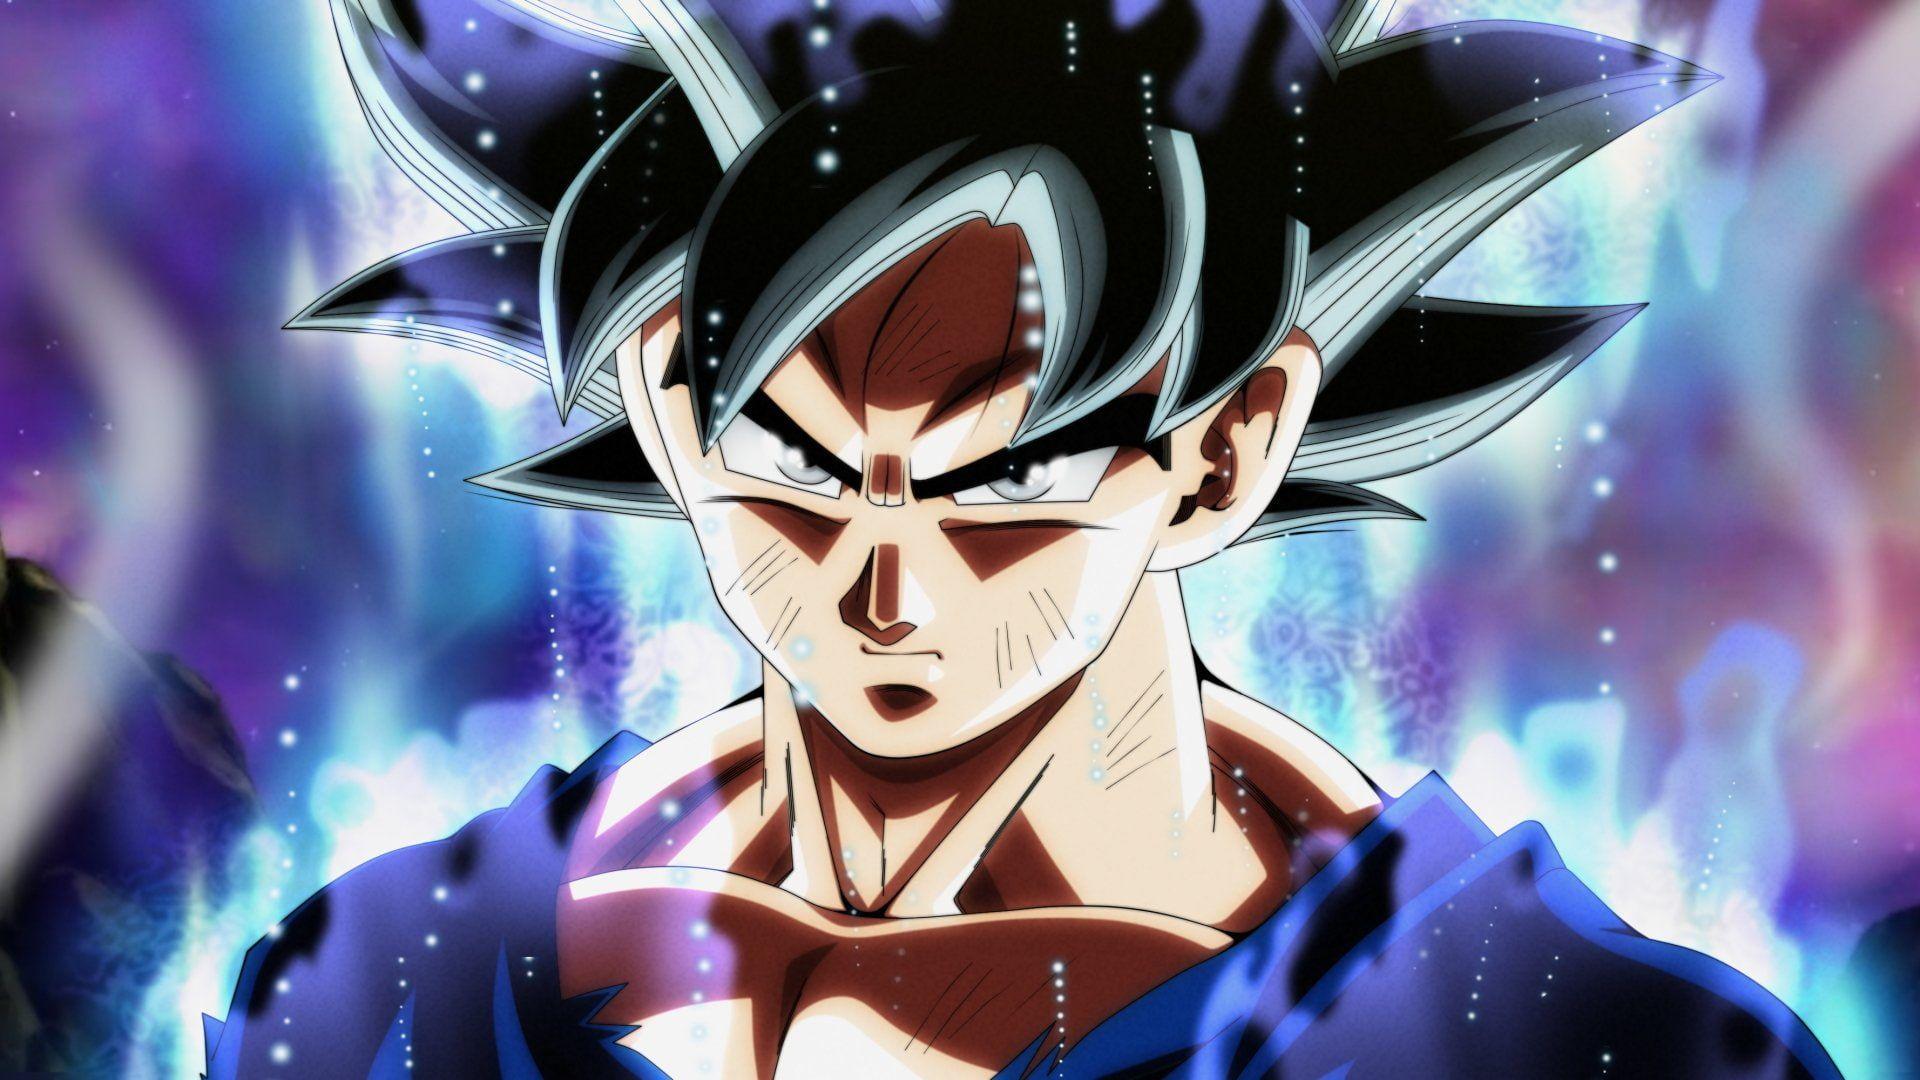 Dragon Ball Dragon Ball Super Goku Ultra Instinct Dragon Ball 1080p Wallpape Dragon Ball Z Iphone Wallpaper Dragon Ball Super Goku Anime Dragon Ball Super